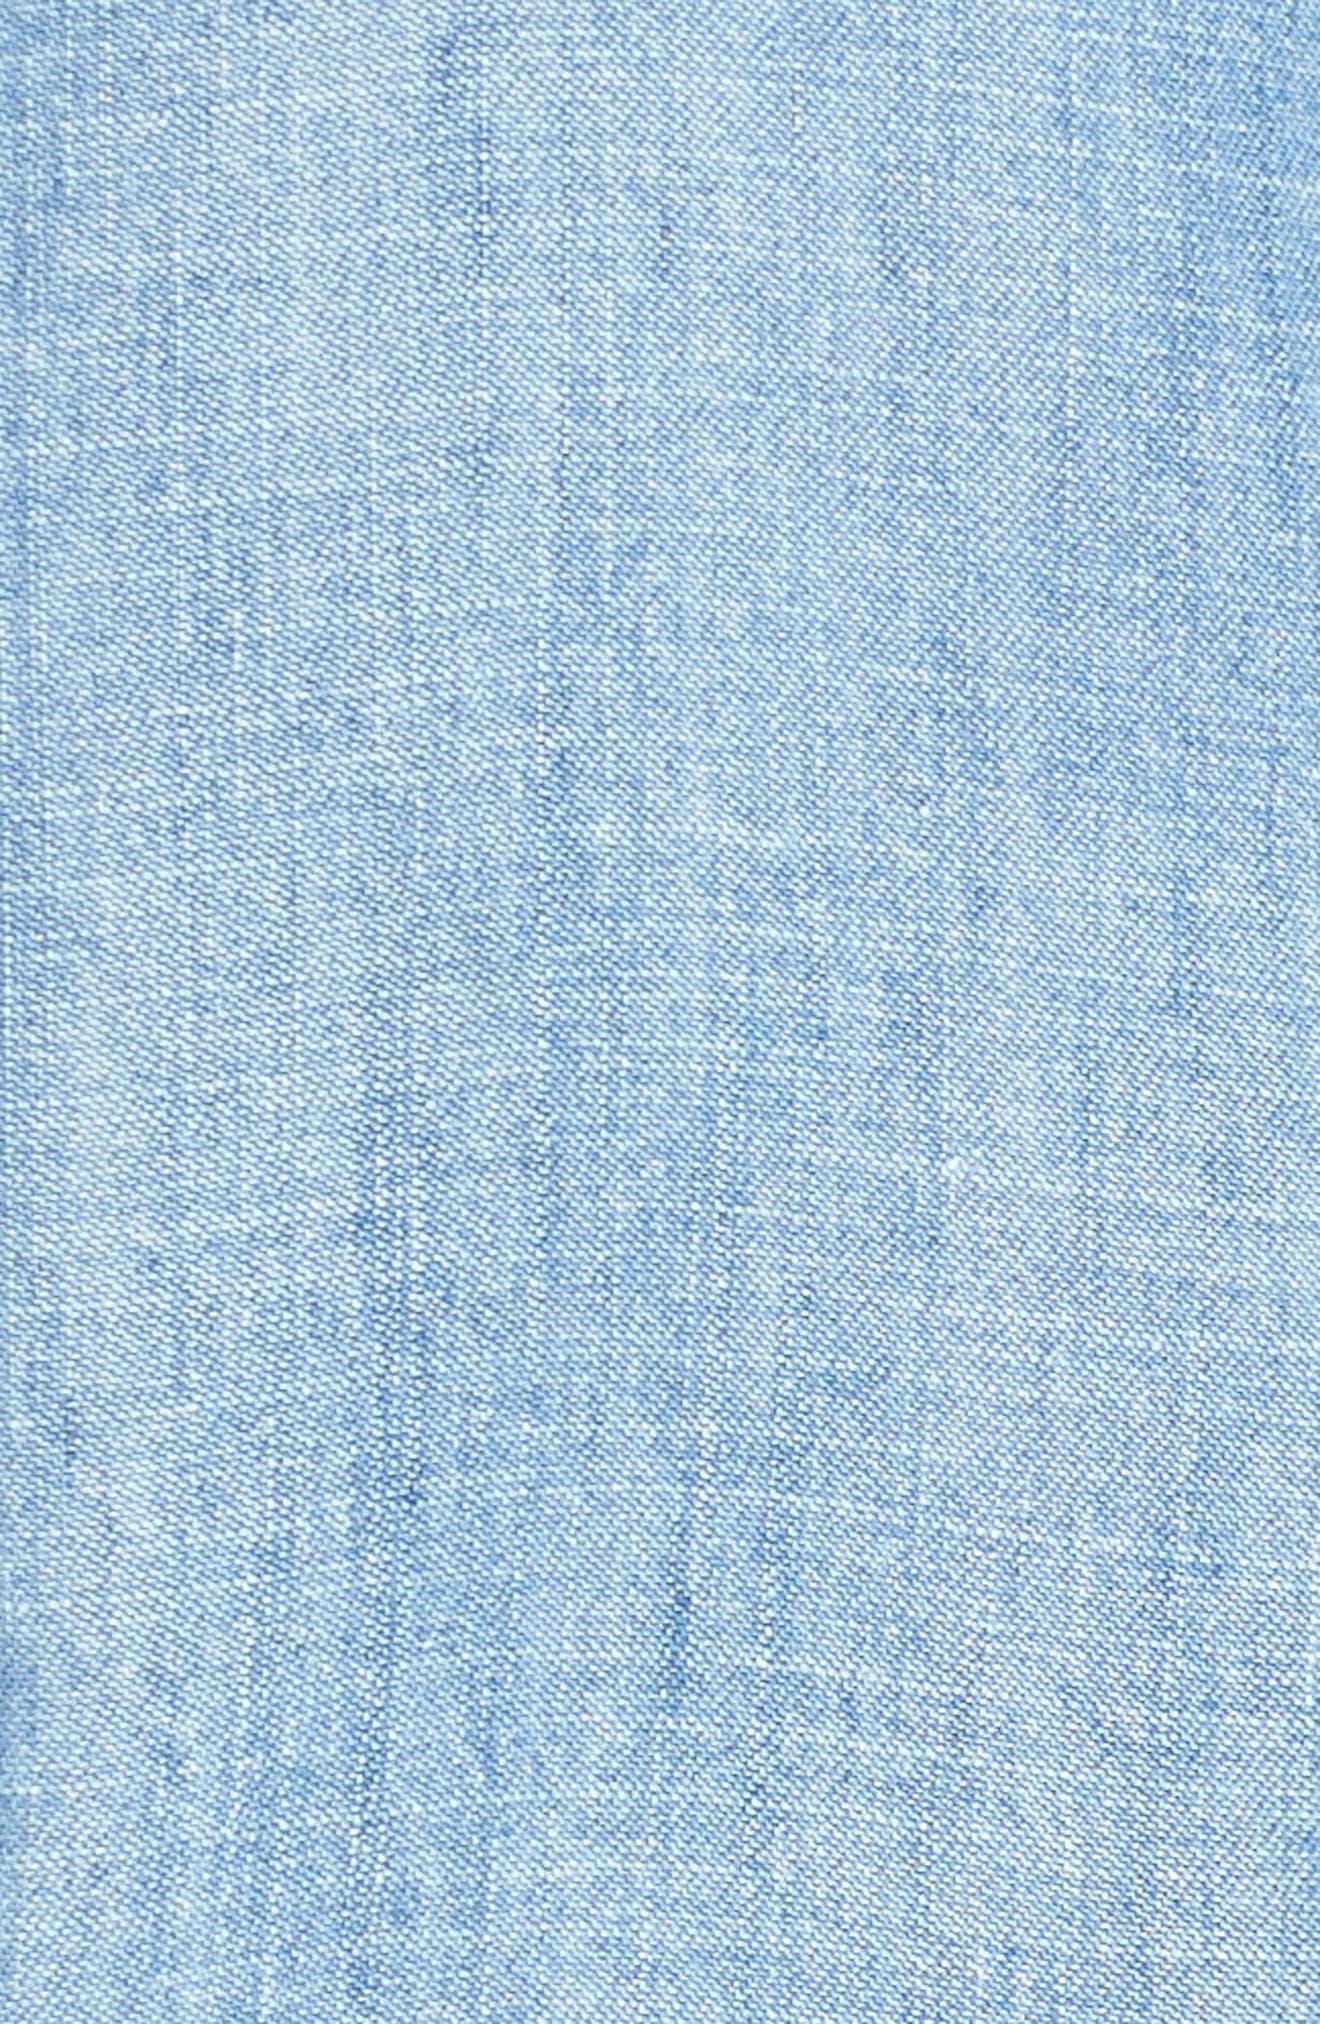 Alternate Image 5  - Rails Ingrid Chambray Shirt